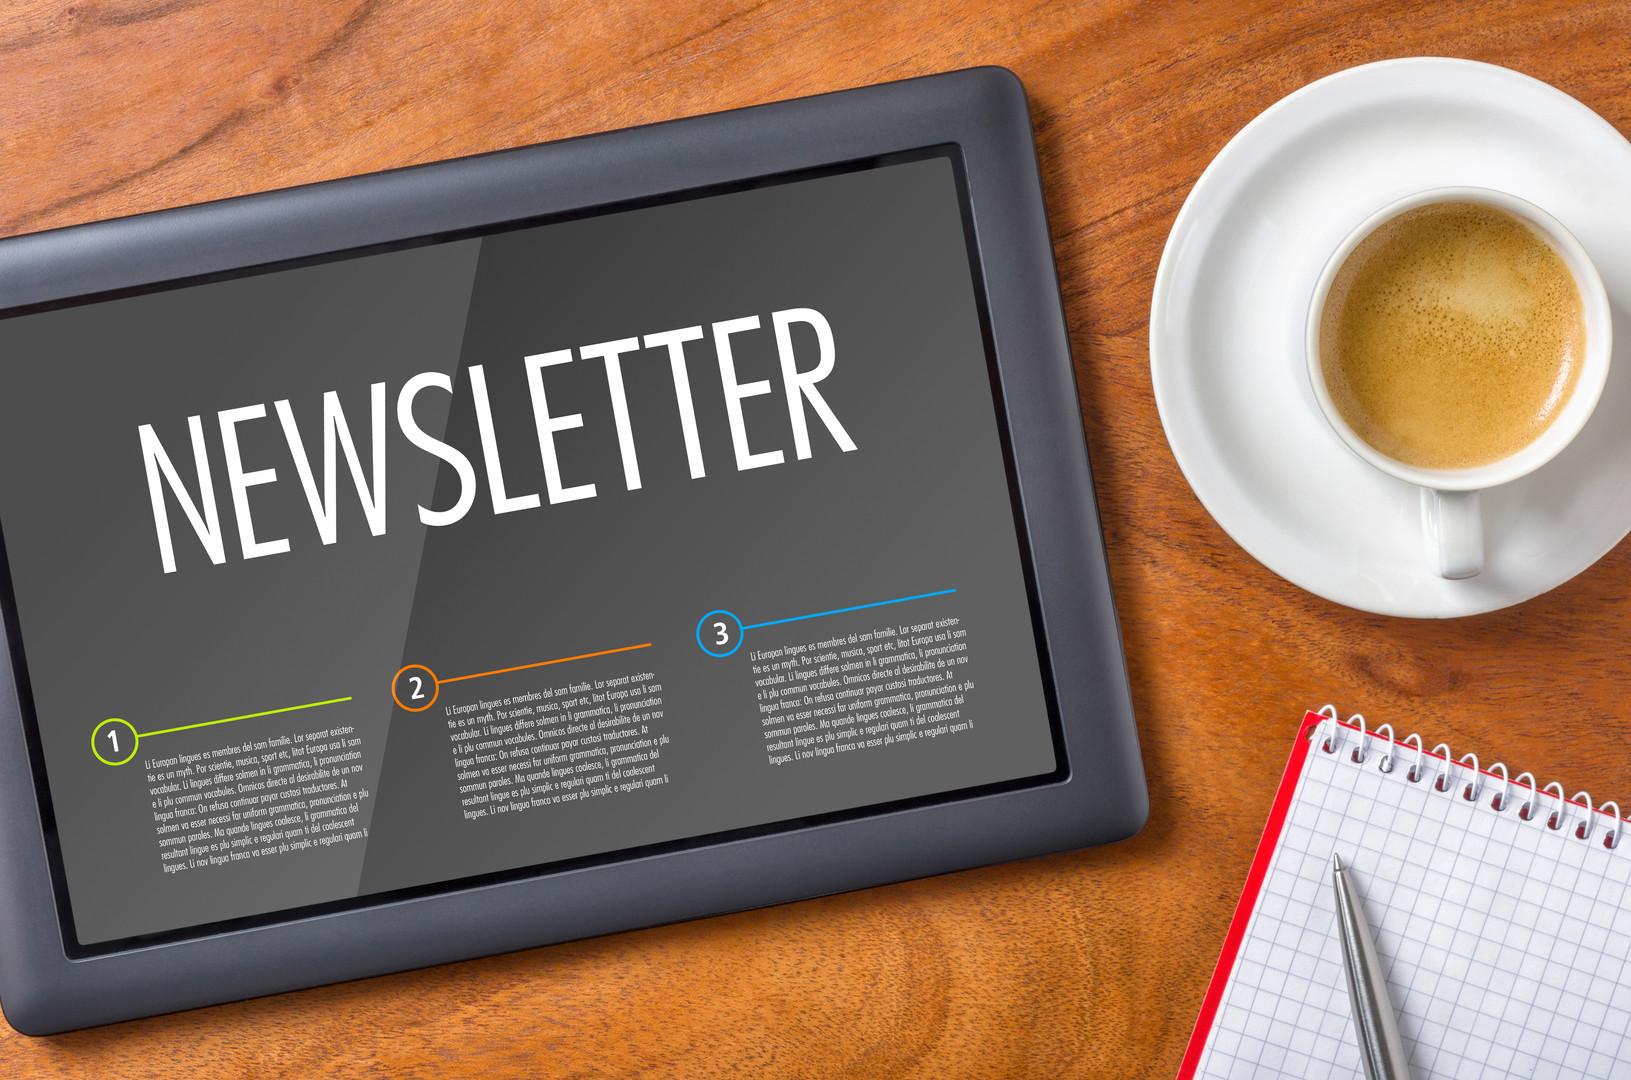 Tablet on a desk - Newsletter.jpg